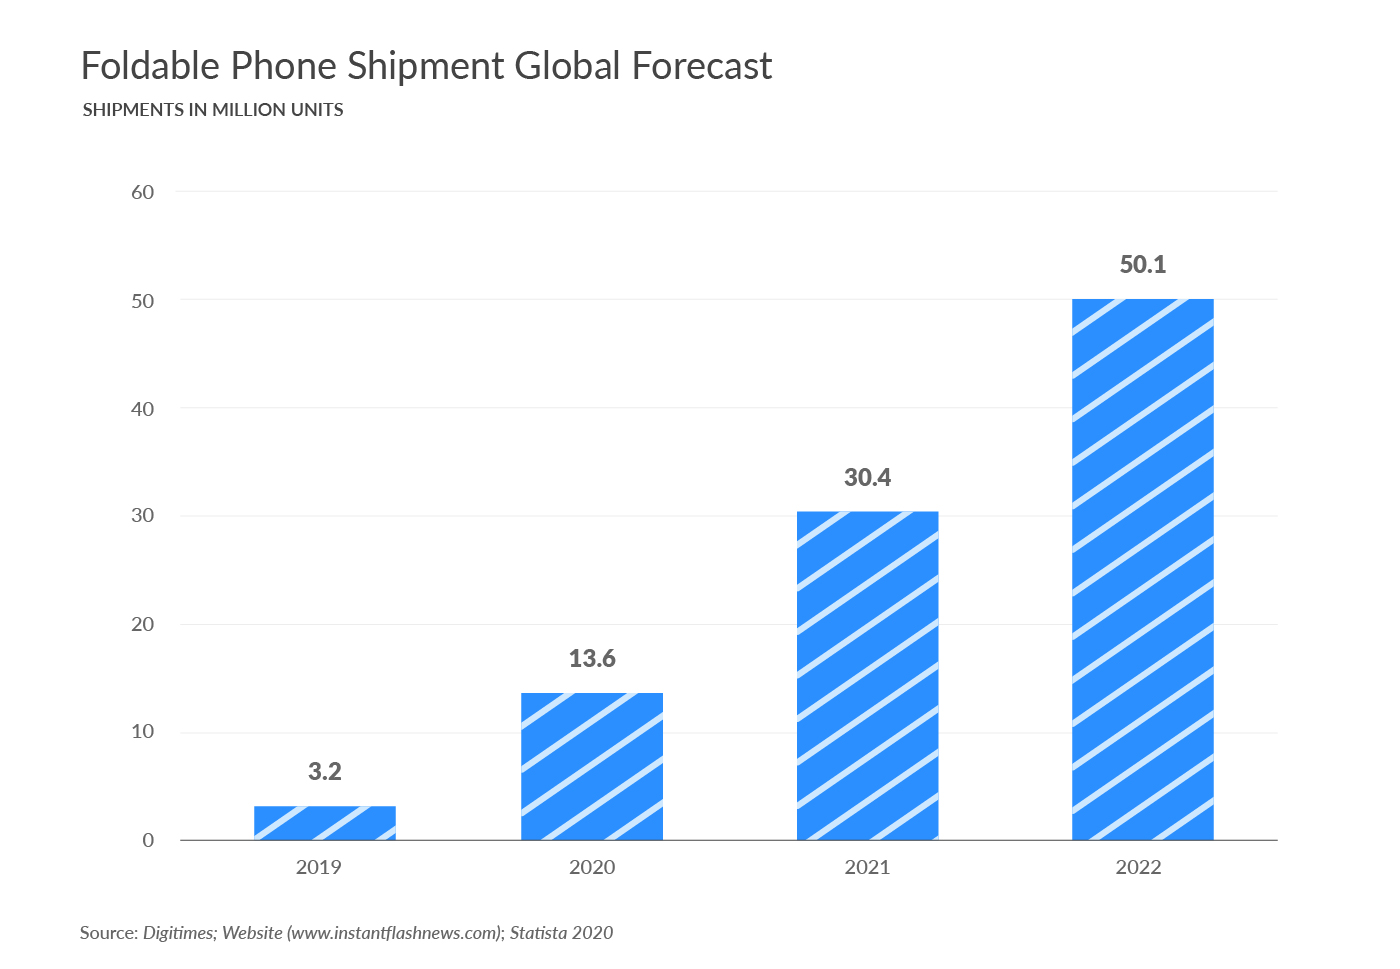 Foldable Phone Shipment Global Forecast